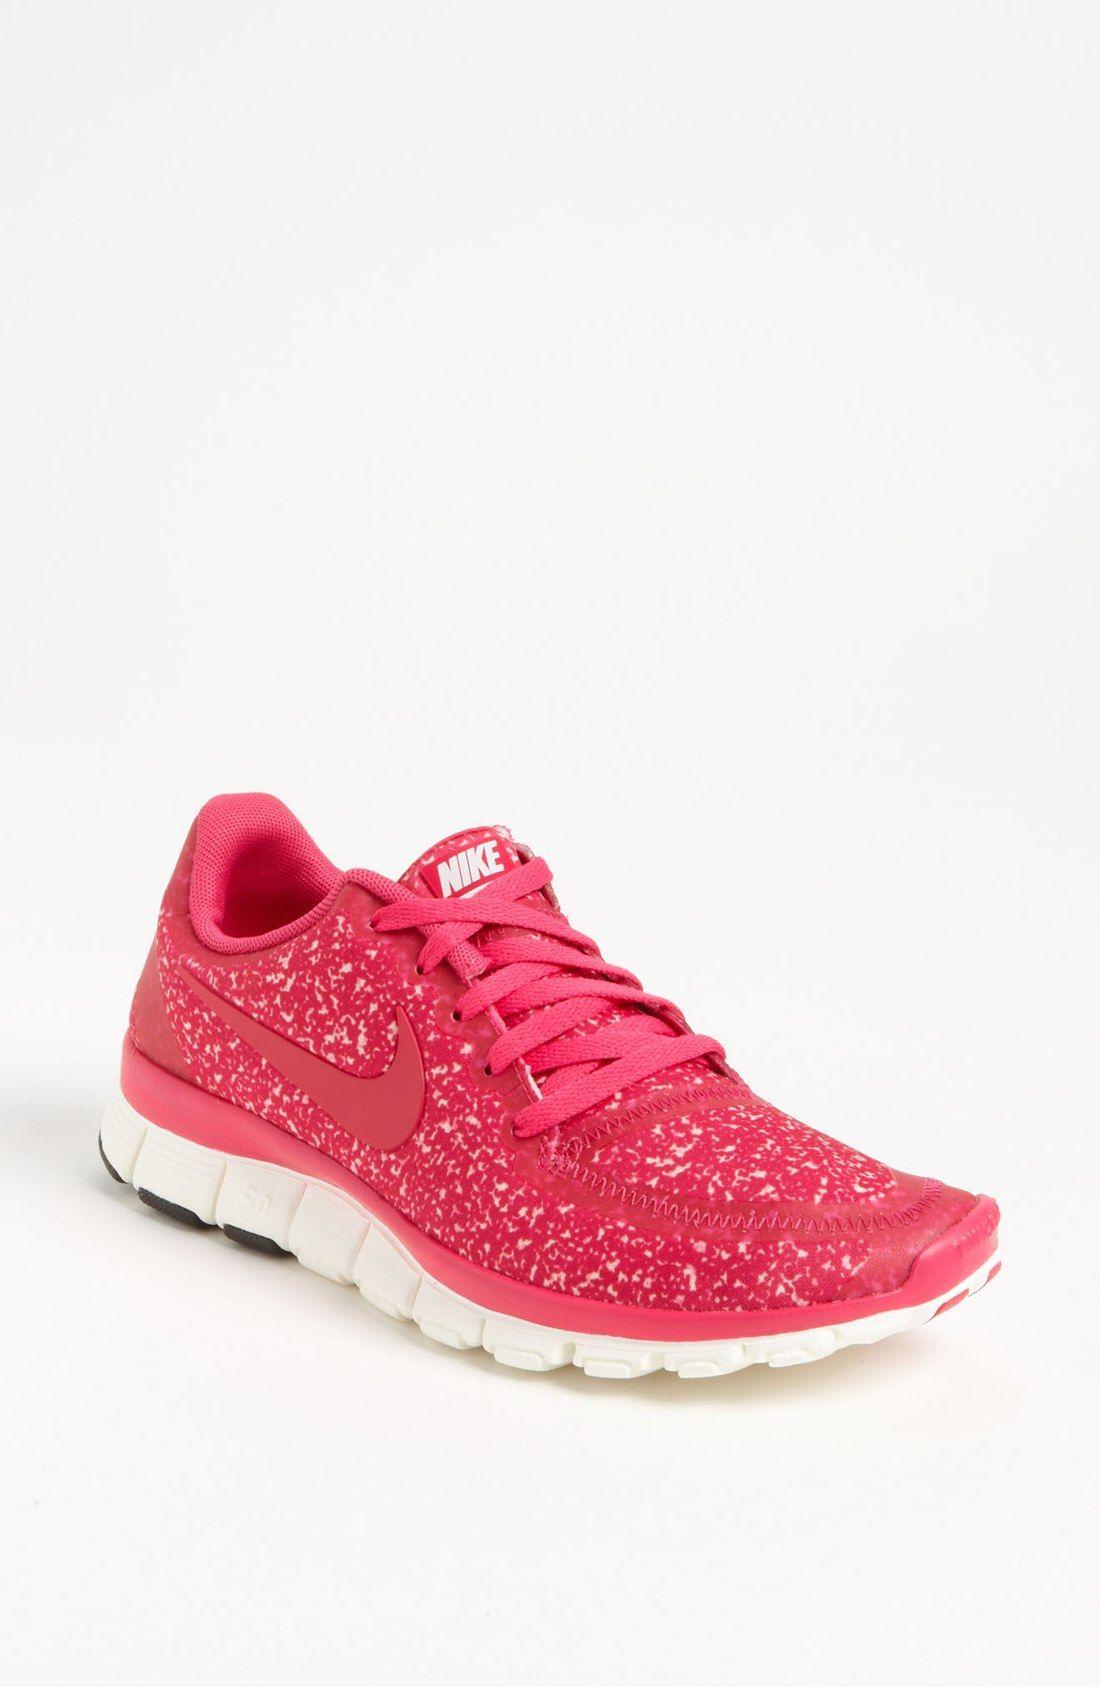 Nike Chaussures Gratuit Léopard 5,0 Chez Sears Canada V4